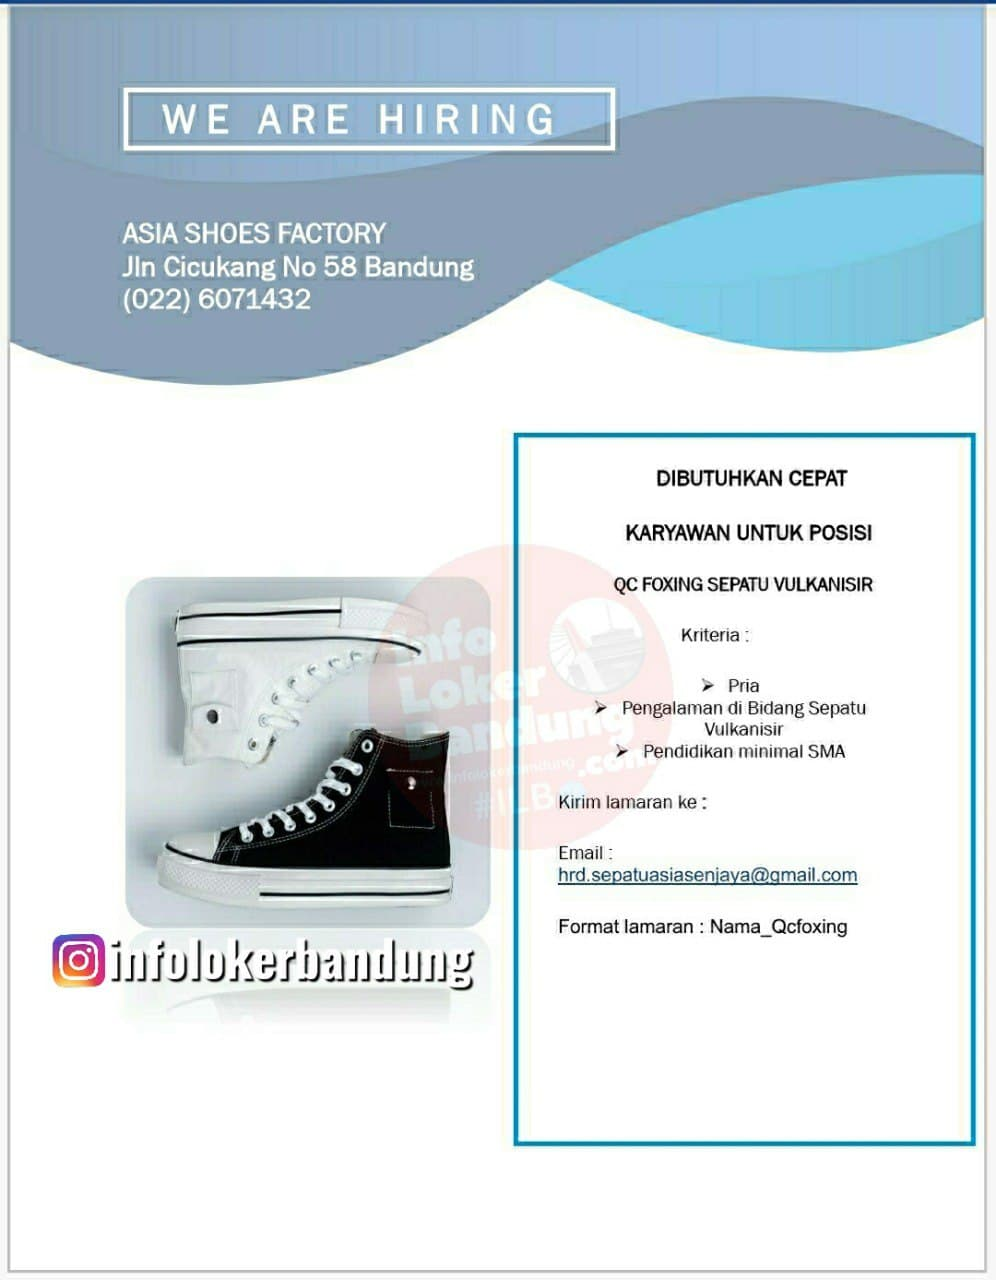 Lowongan Kerja PT. Asia Shoes Factory Bandung November 2020